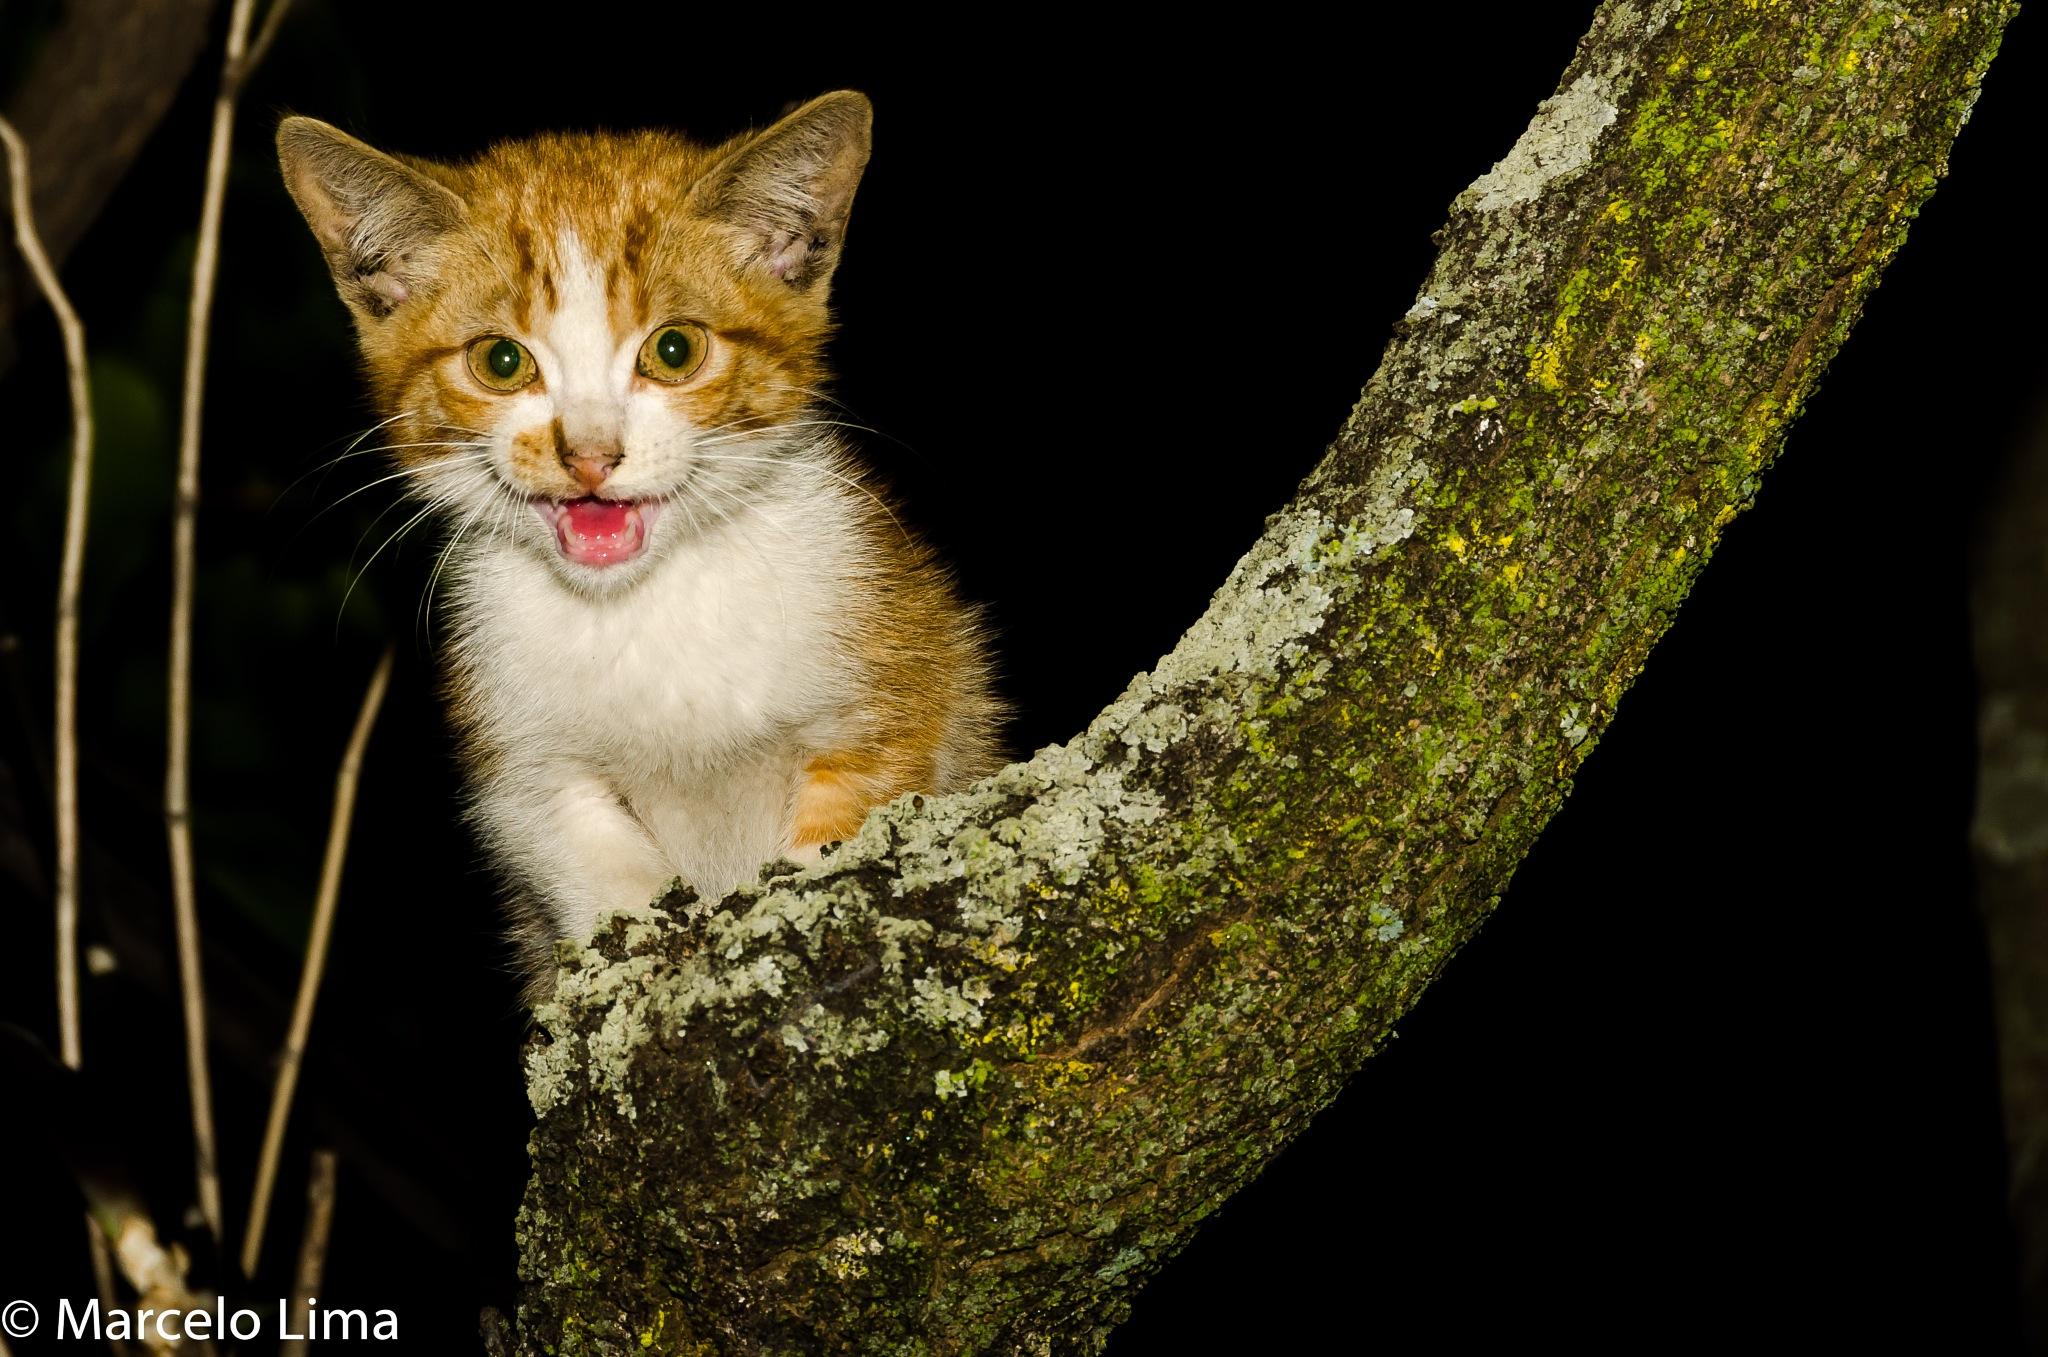 Cat by Marcelo Lima